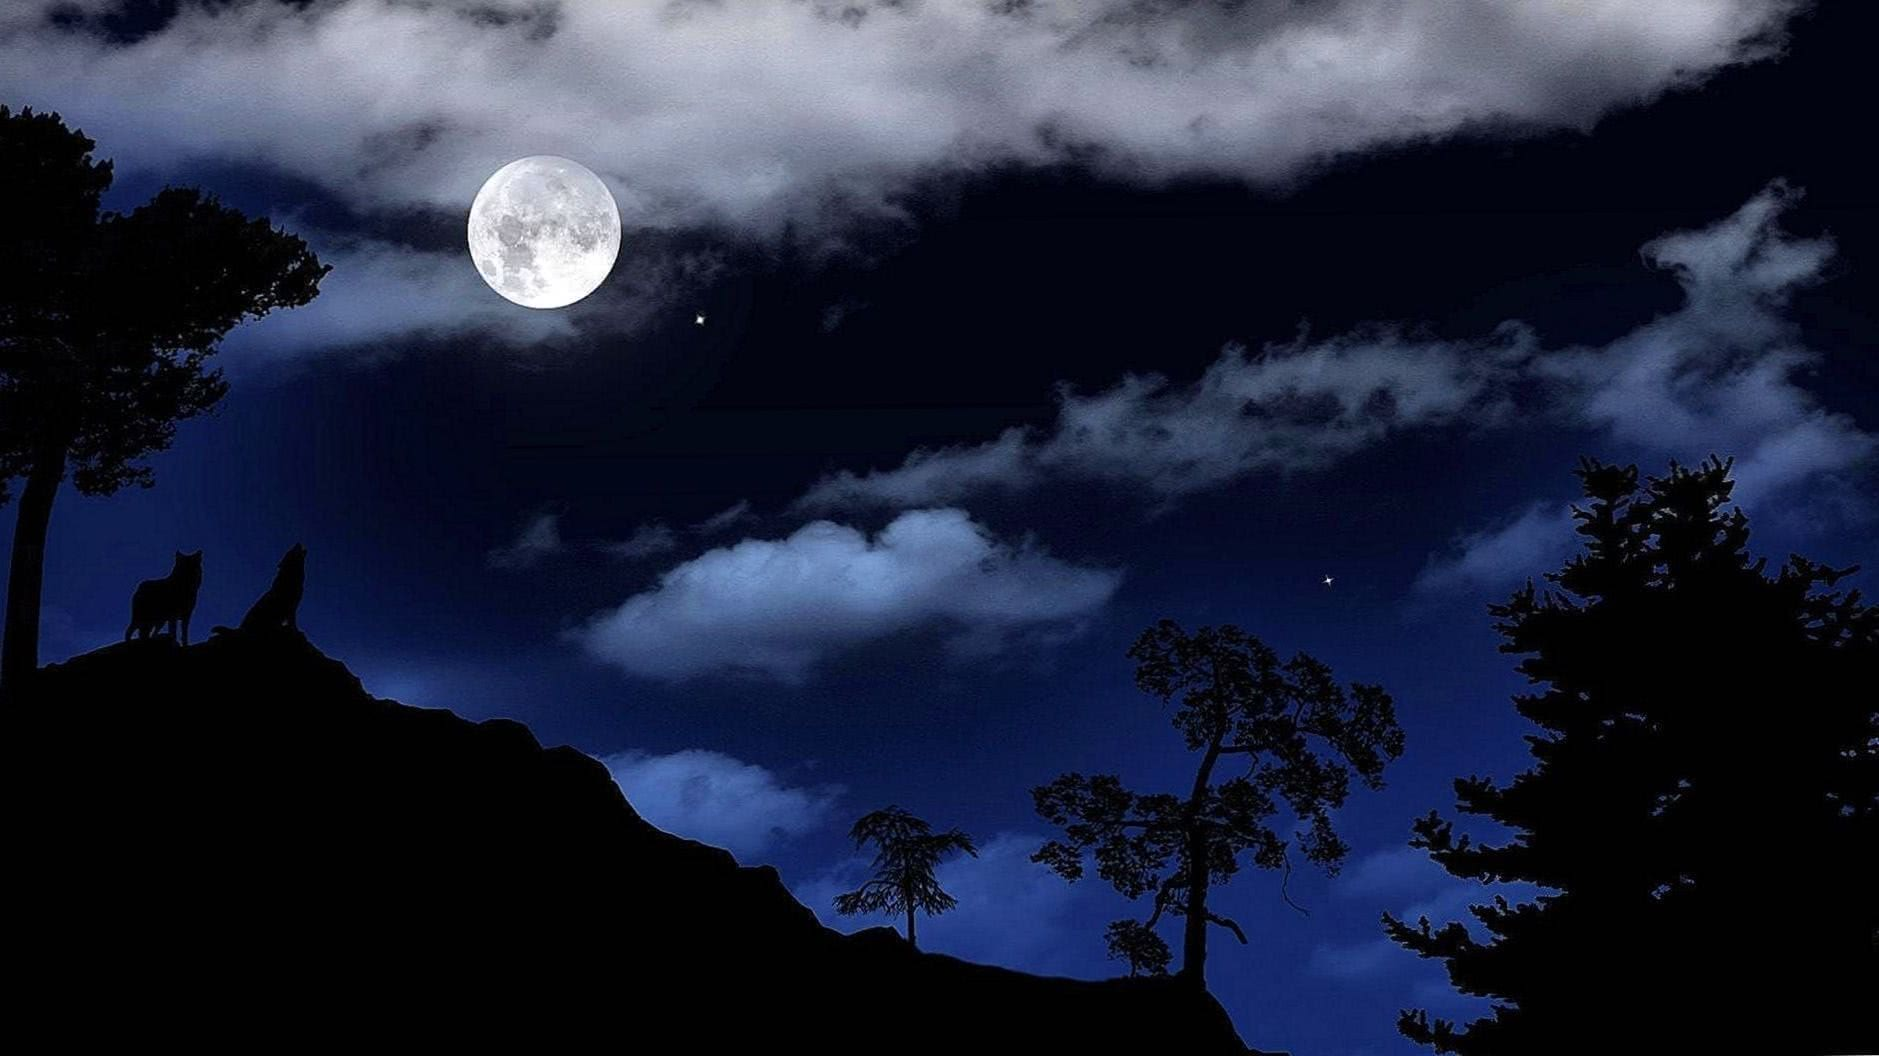 Wolf Moonlight HD Wallpaper